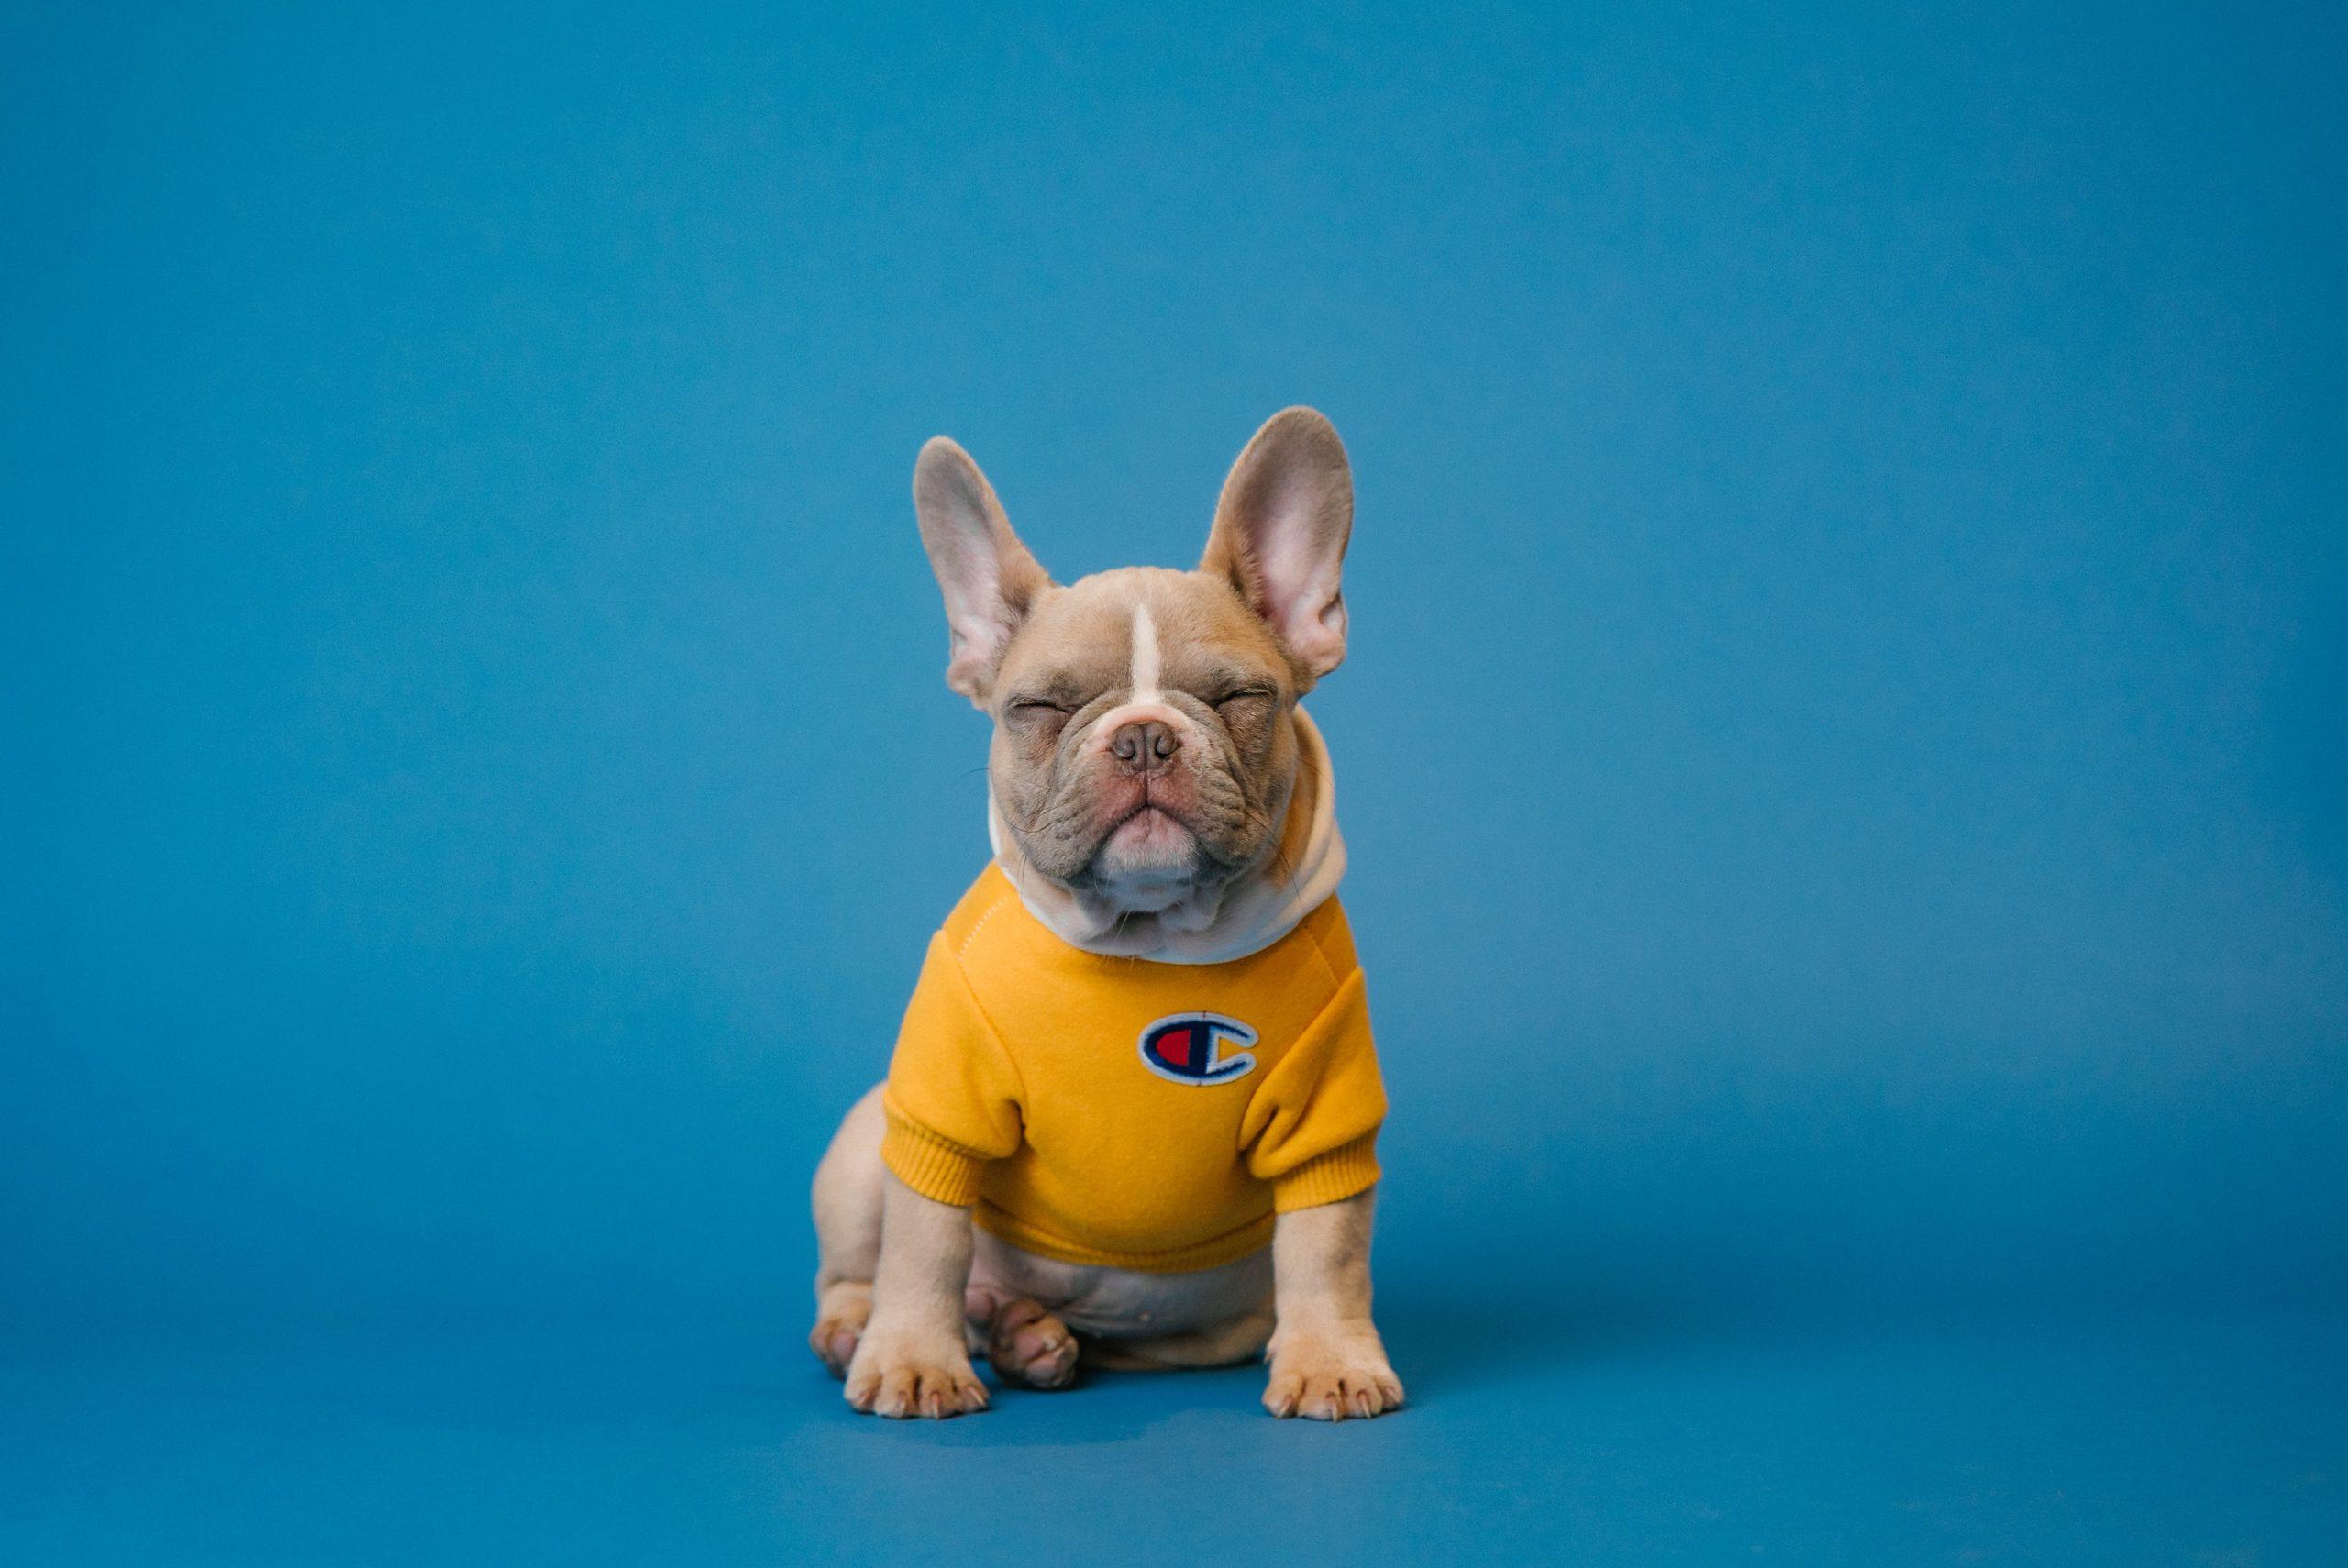 French Bulldog Dressed in T-Shirt